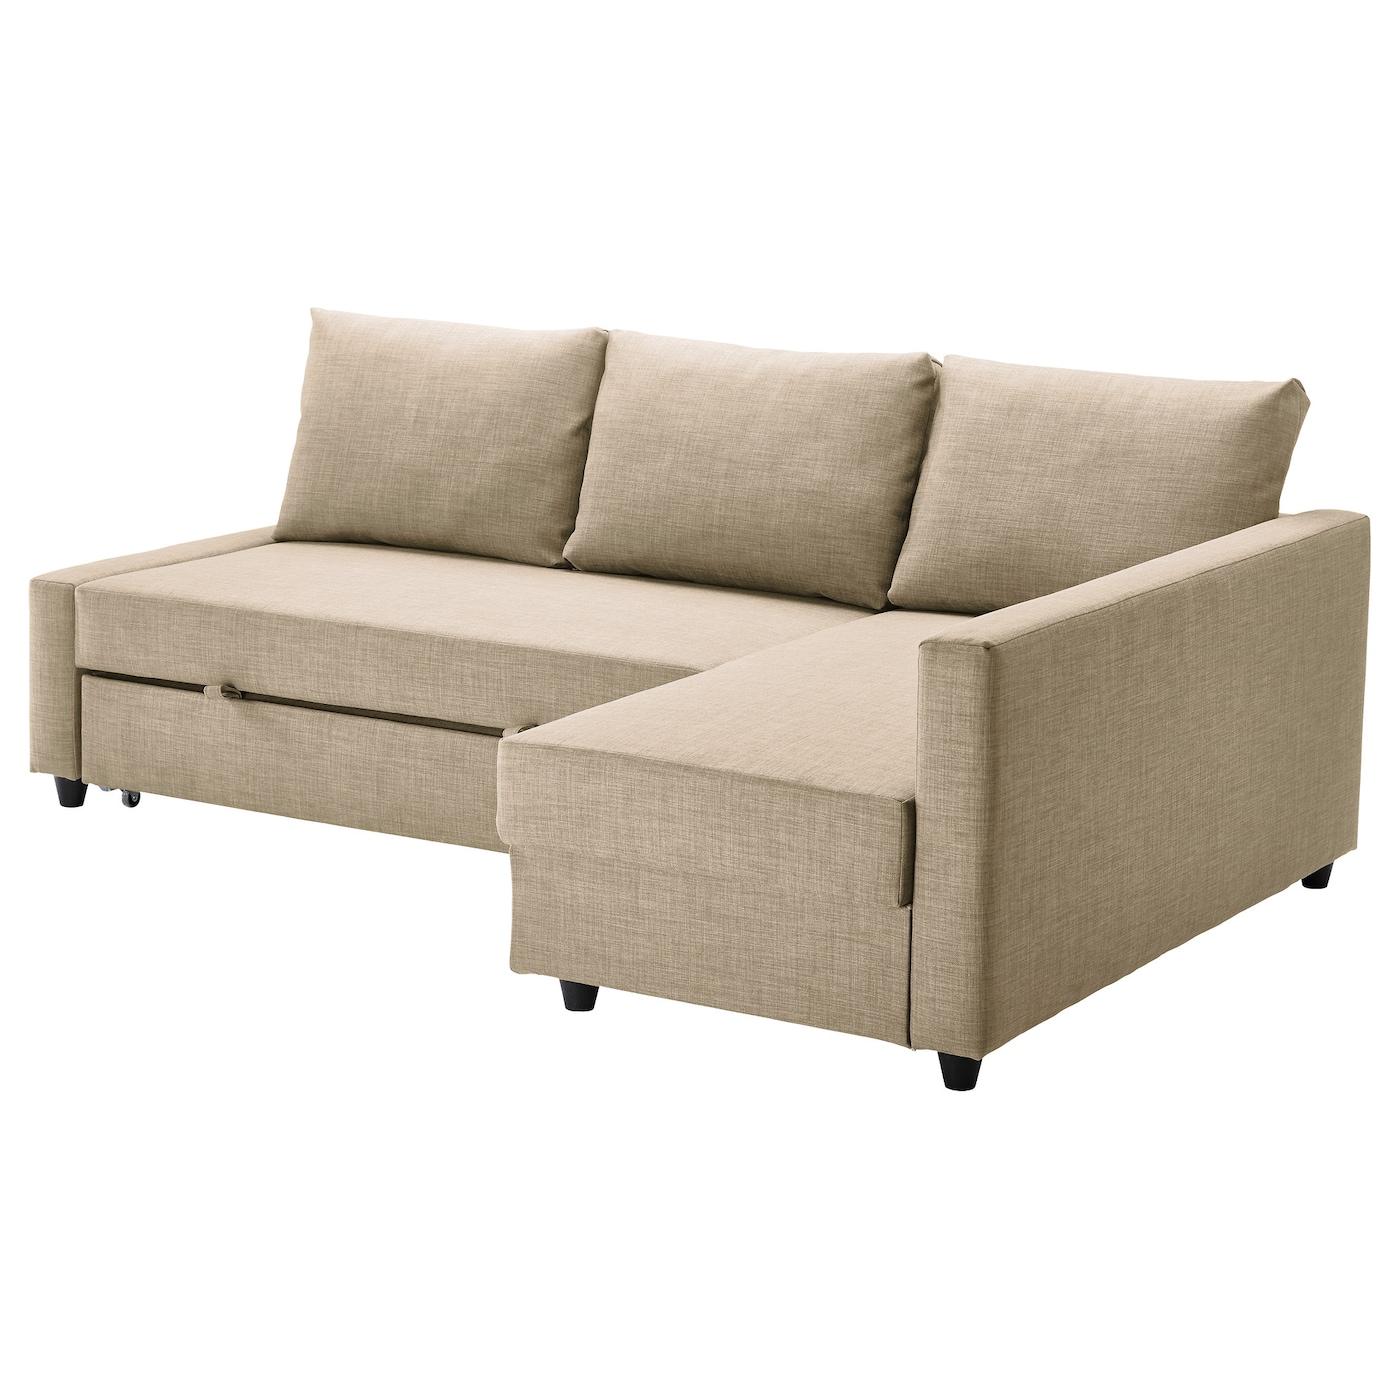 friheten canapé conv d'angle avec rangement skiftebo beige - ikea